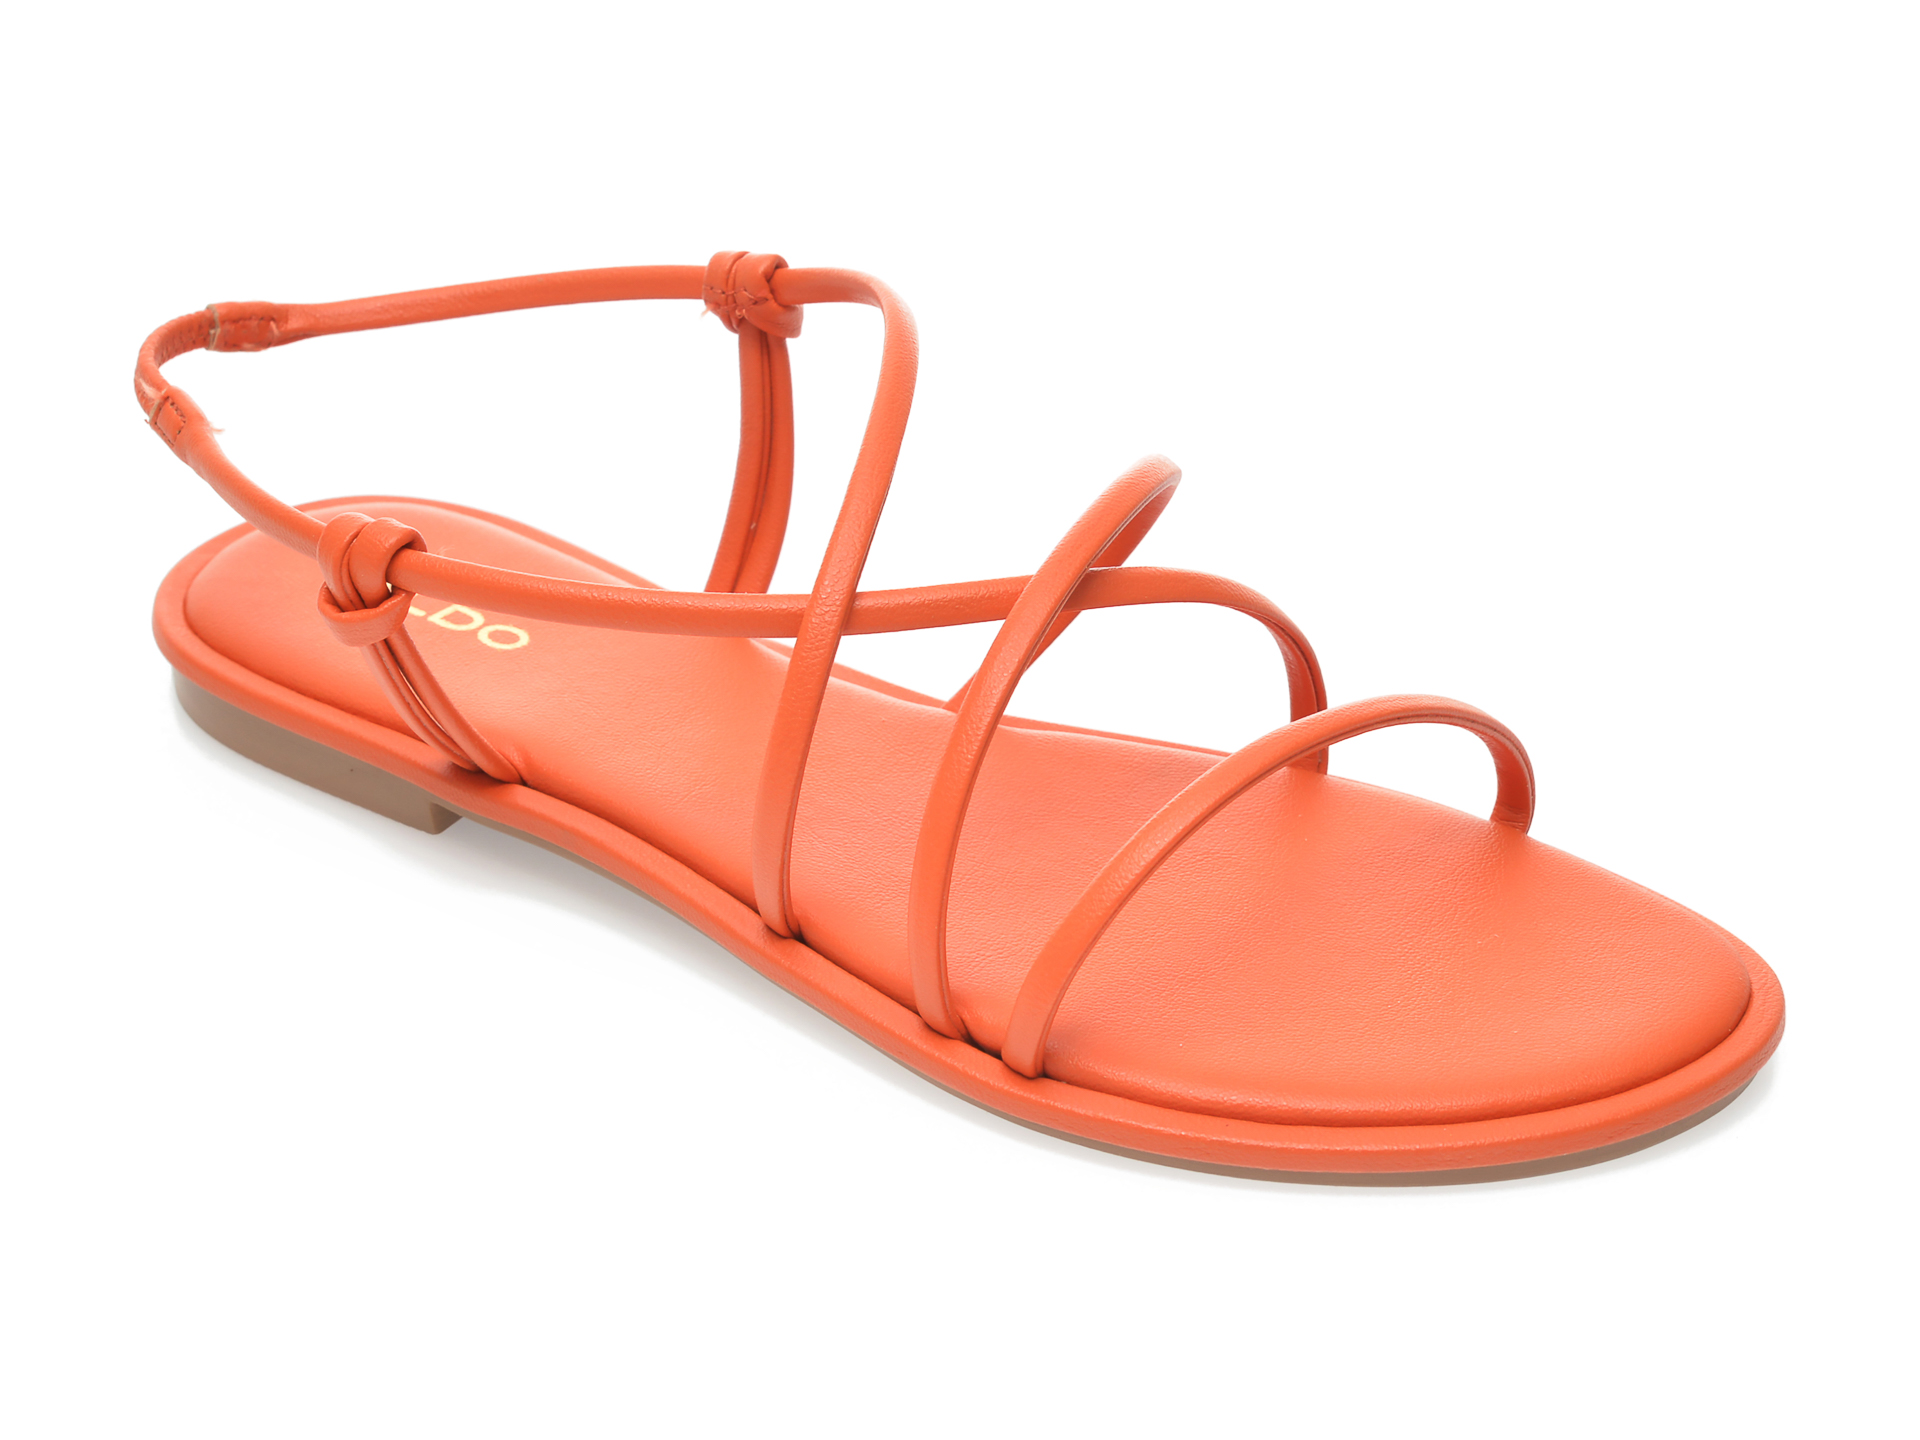 Sandale ALDO portocalii, Kuerten800, din piele ecologica imagine otter.ro 2021